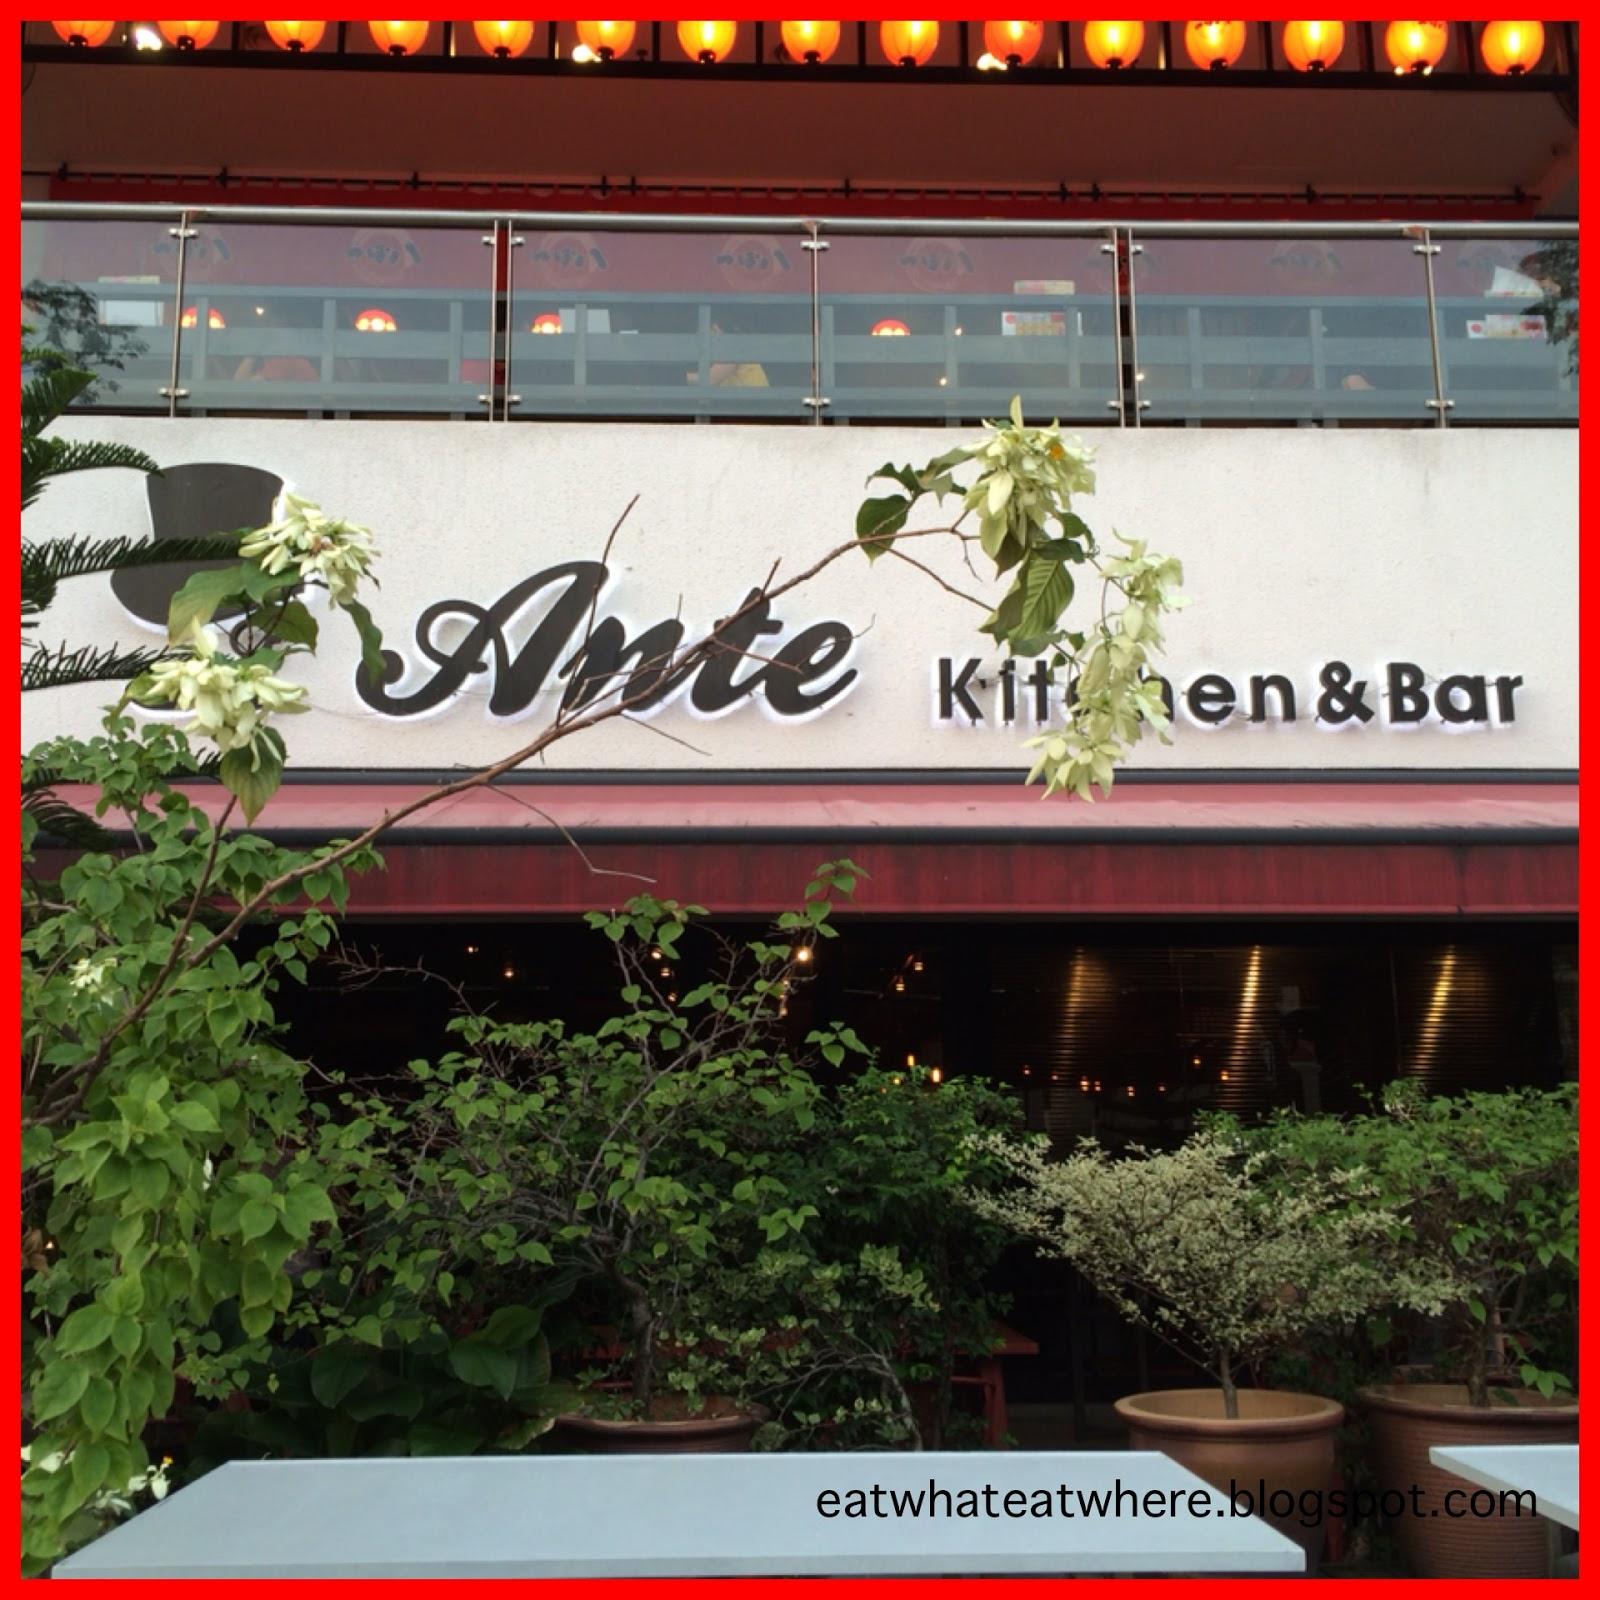 Eat What, Eat Where?: Ante Kitchen & Bar @ Solaris Dutamas